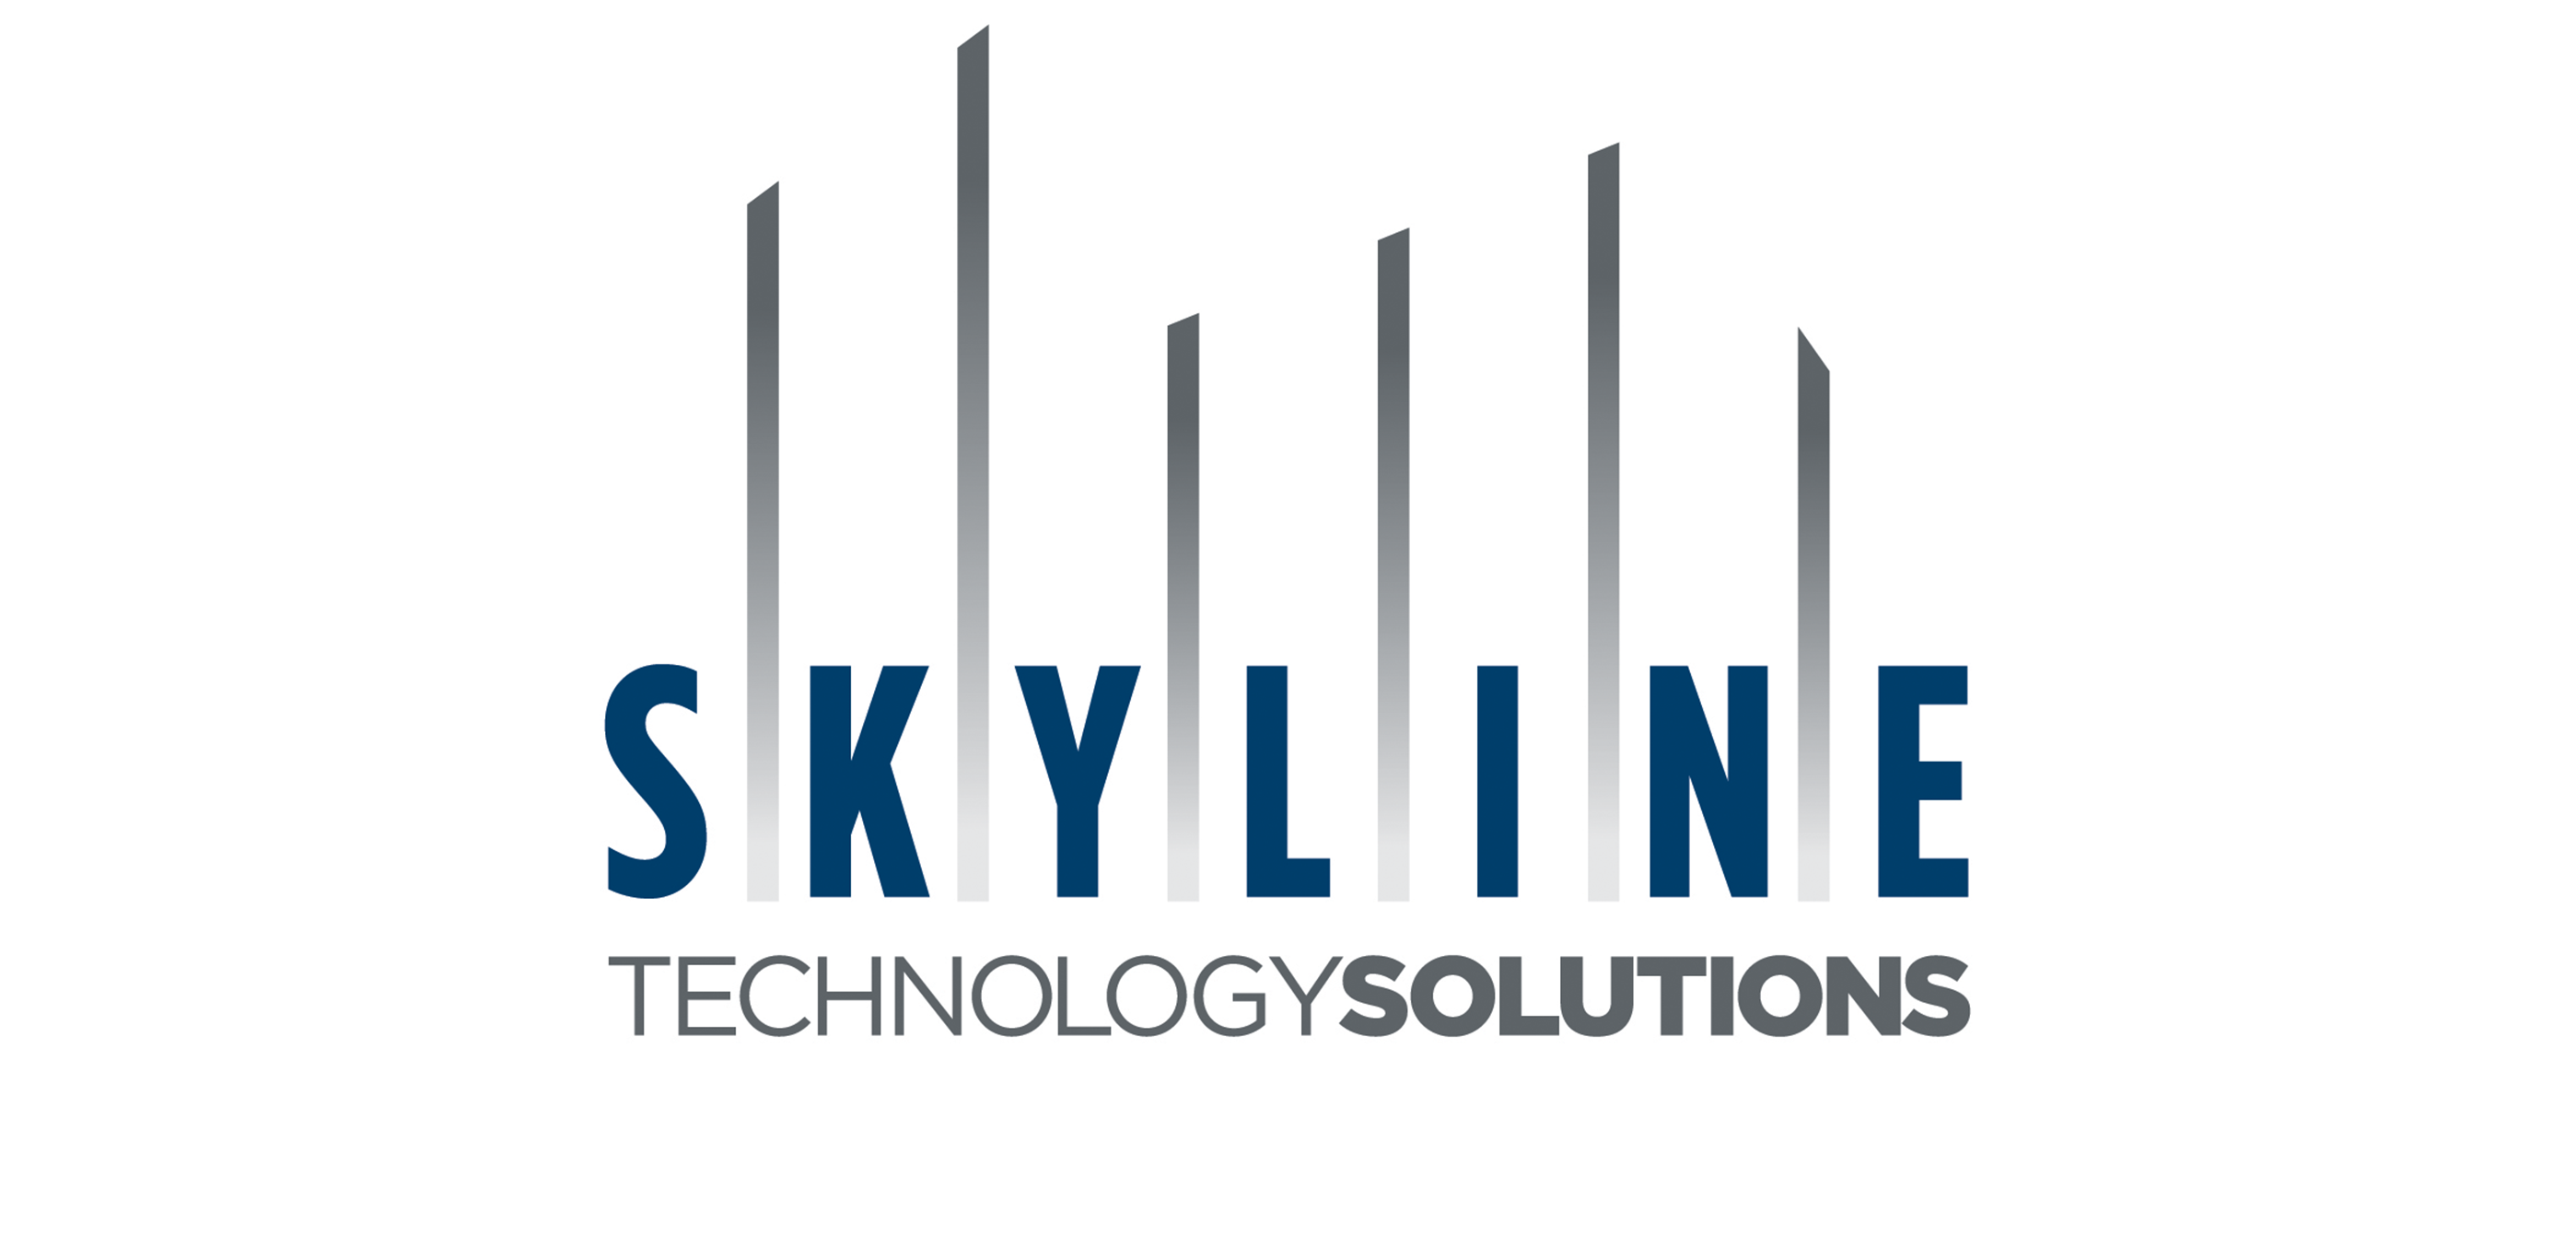 Skyline Technology Solutions - Case Study - Side Bar - Company Logo